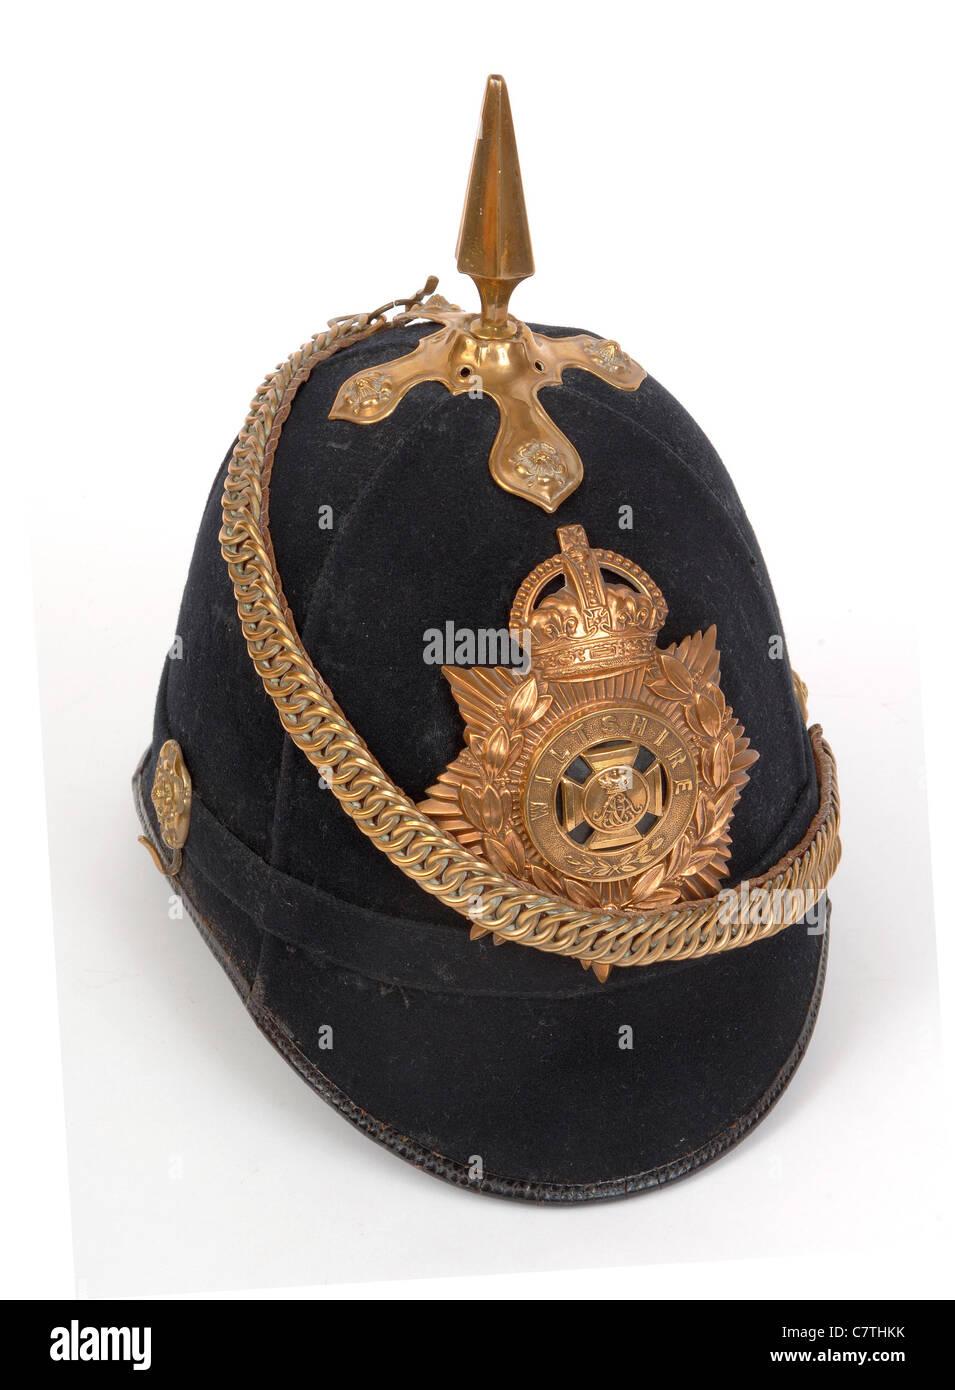 Ww1 Helmet Stock Photos & Ww1 Helmet Stock Images - Alamy